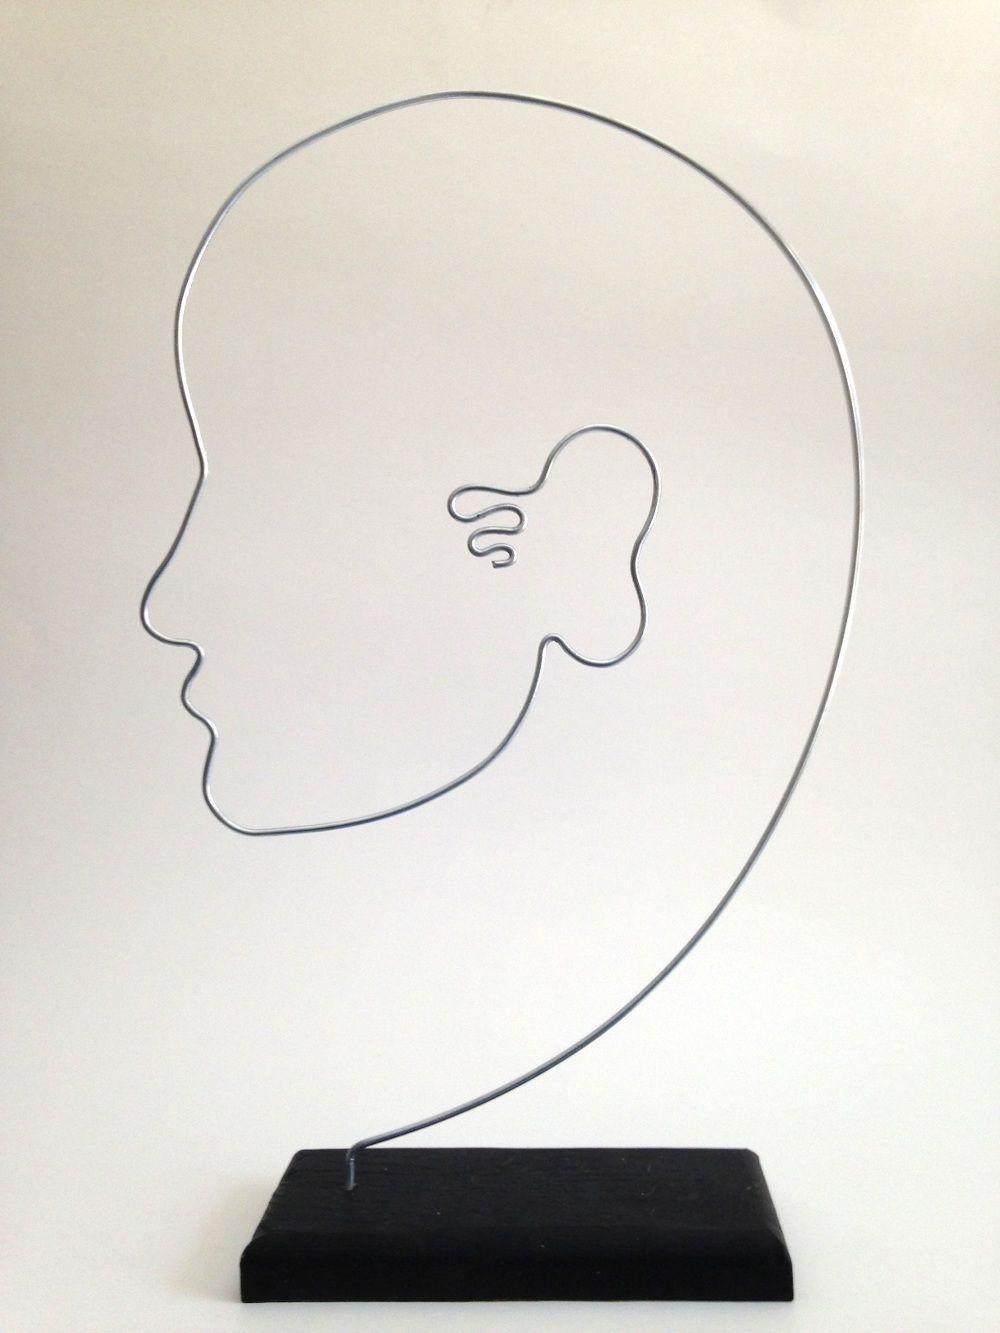 Wire Sculpture - Duncan Sherwood-Forbes   Wire art   Pinterest ...